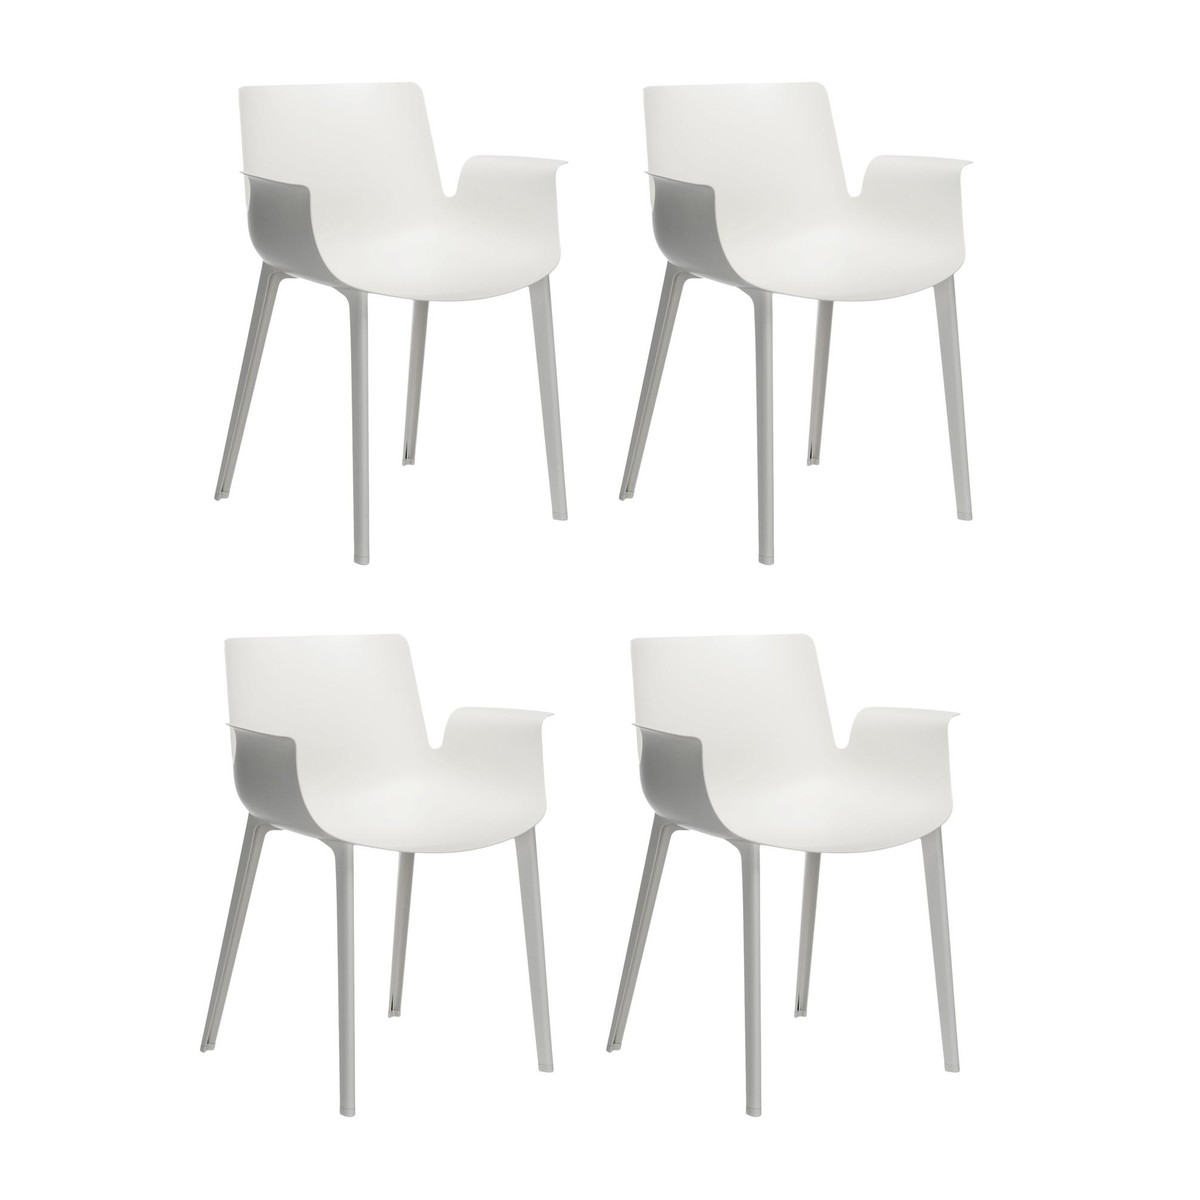 Piuma set de 4 sillas con reposabrazos kartell for Sillas de salon con reposabrazos